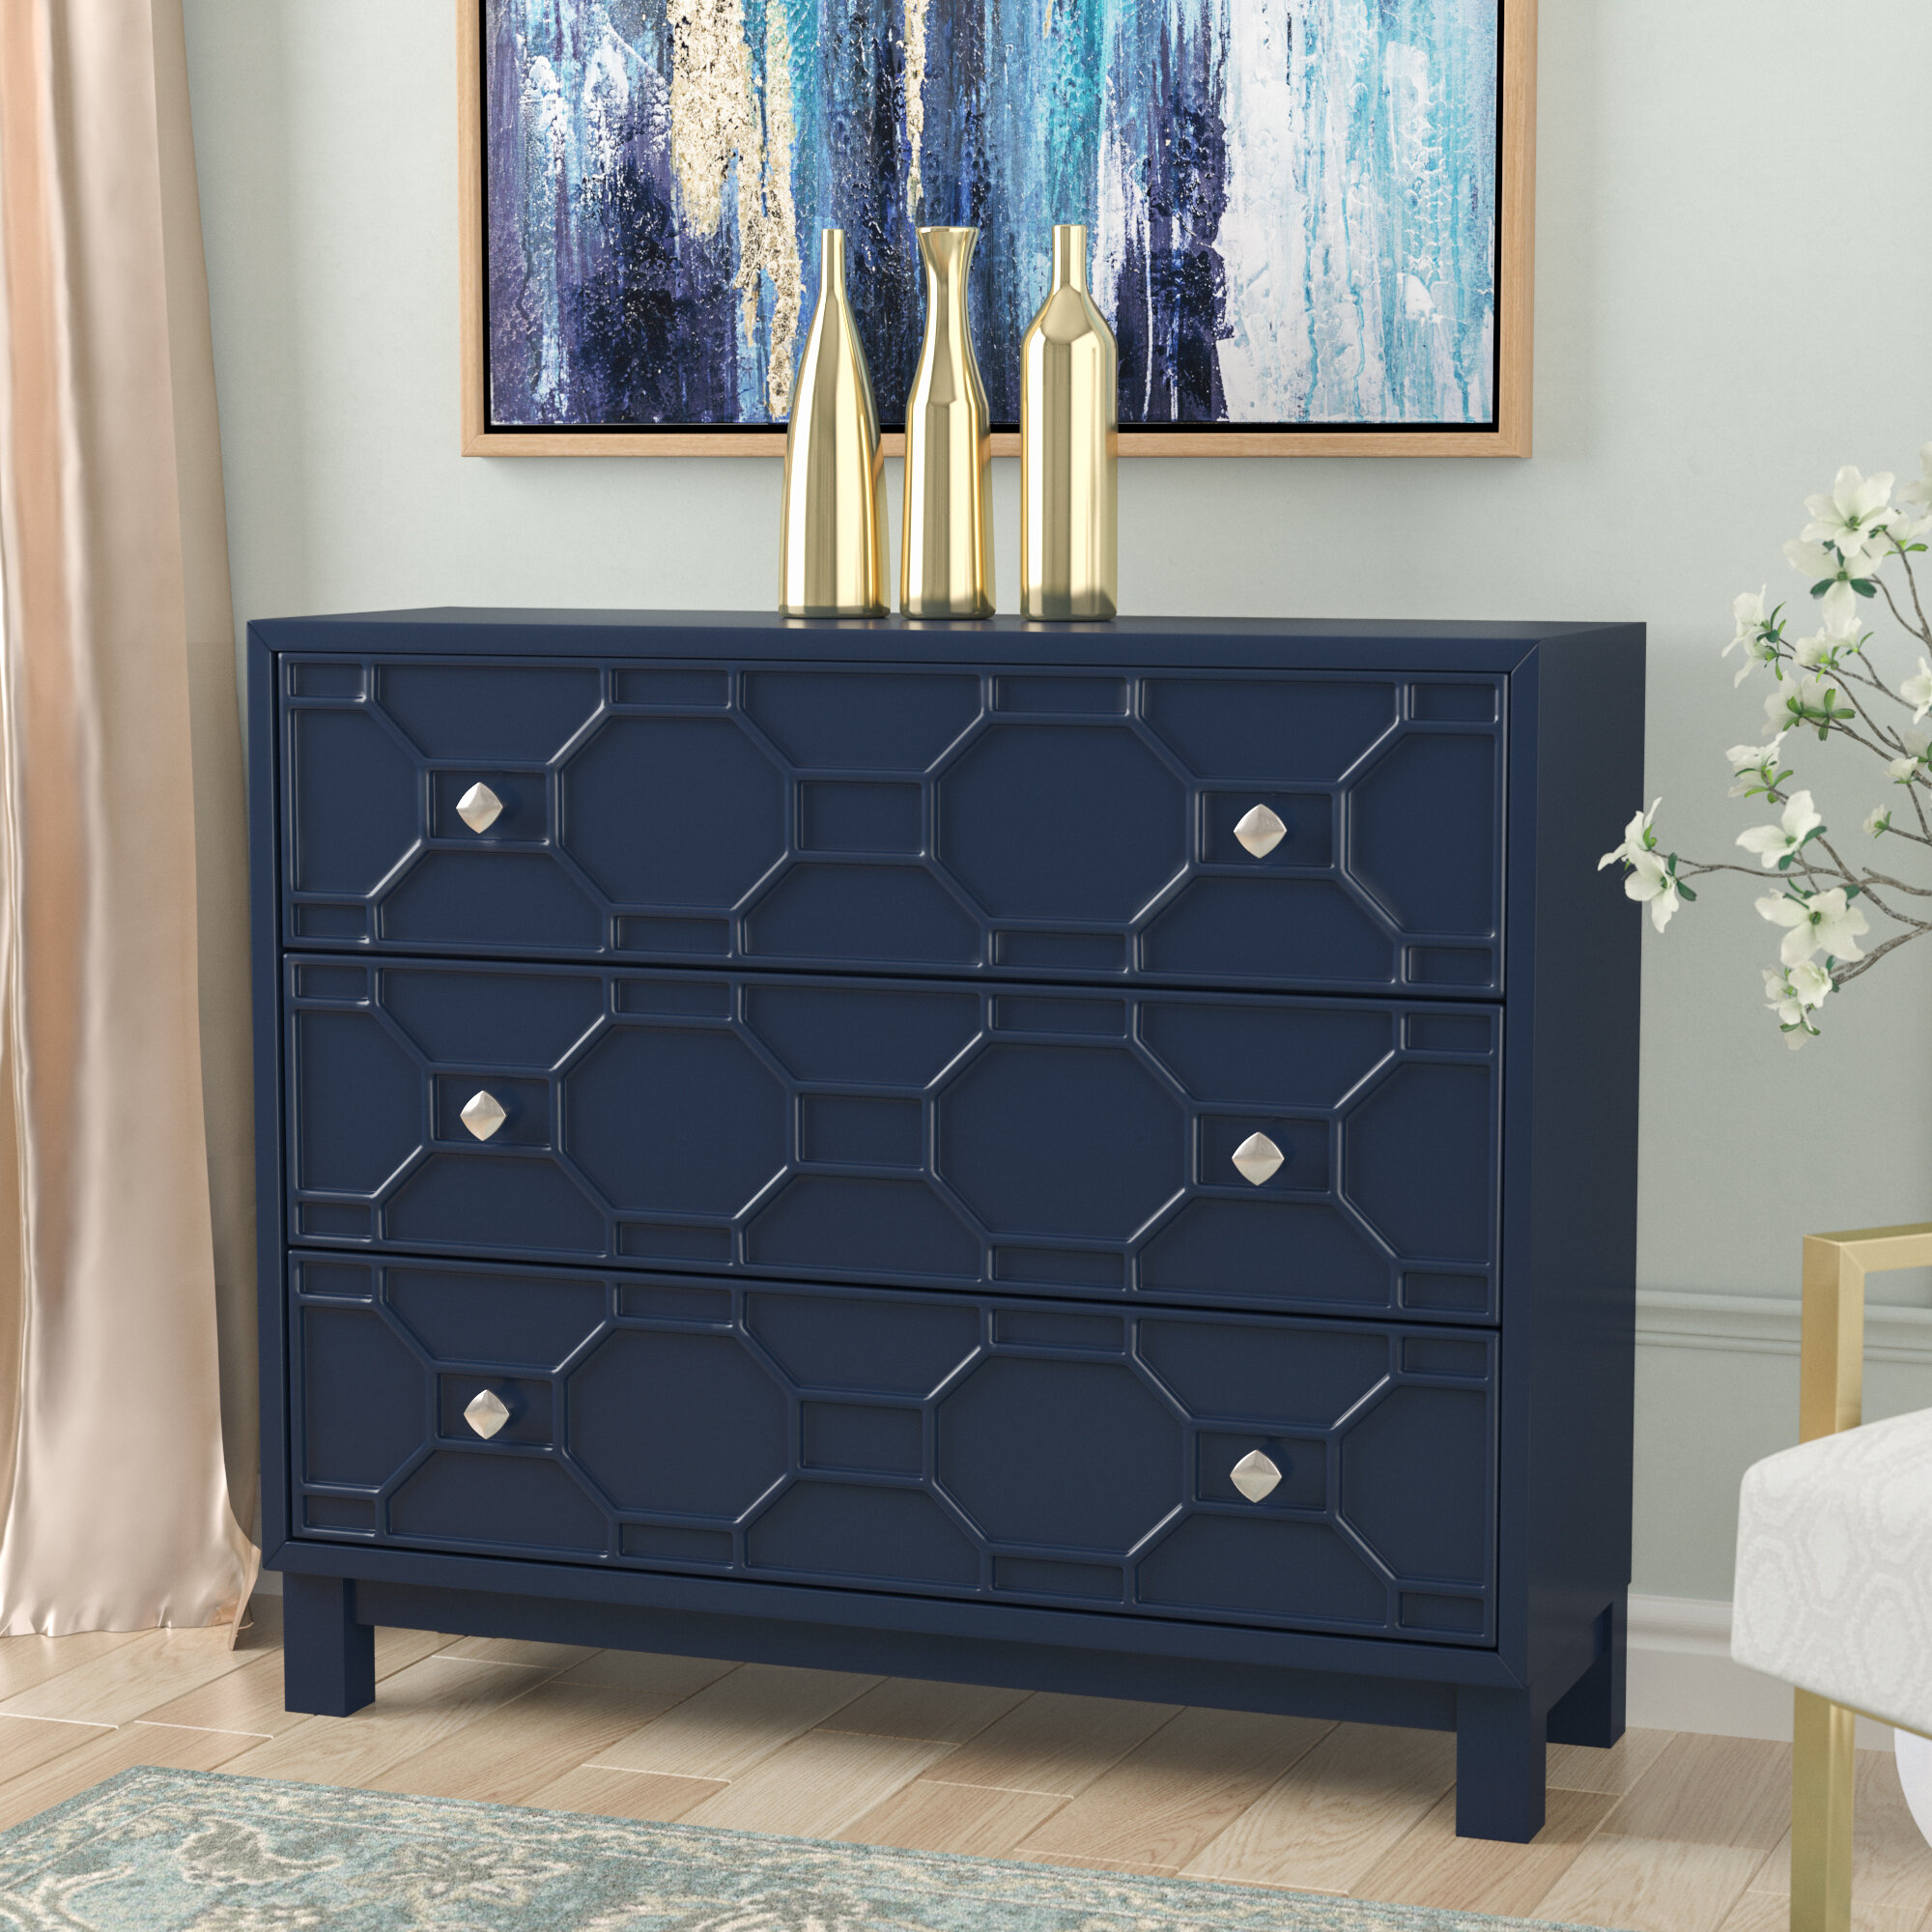 Willa arlo interiors rosen 3 drawer accent chest reviews wayfair